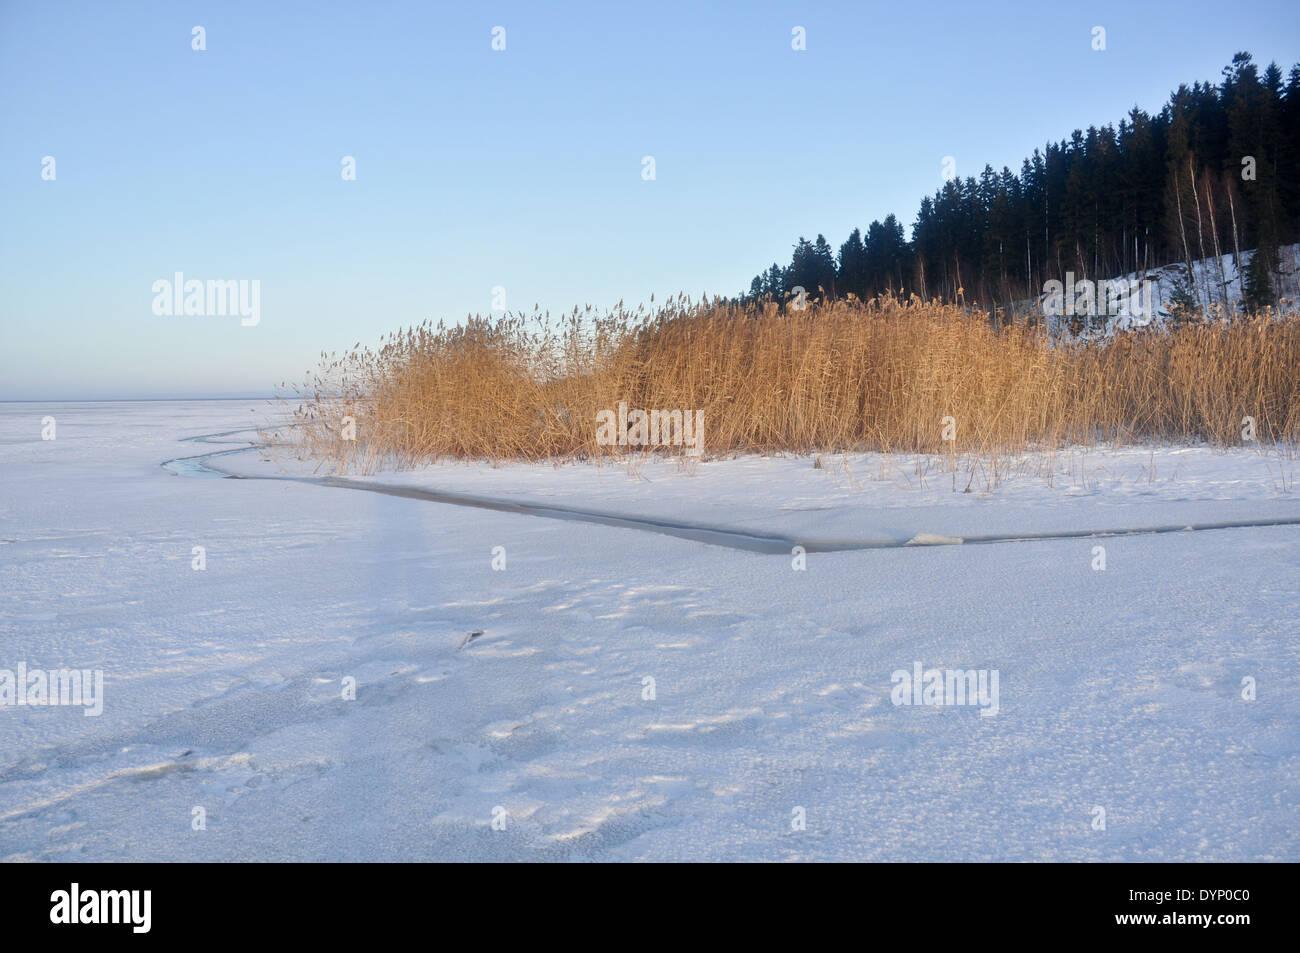 The Pskov lake, the island Belov. Winter landscape. January 2013. Stock Photo